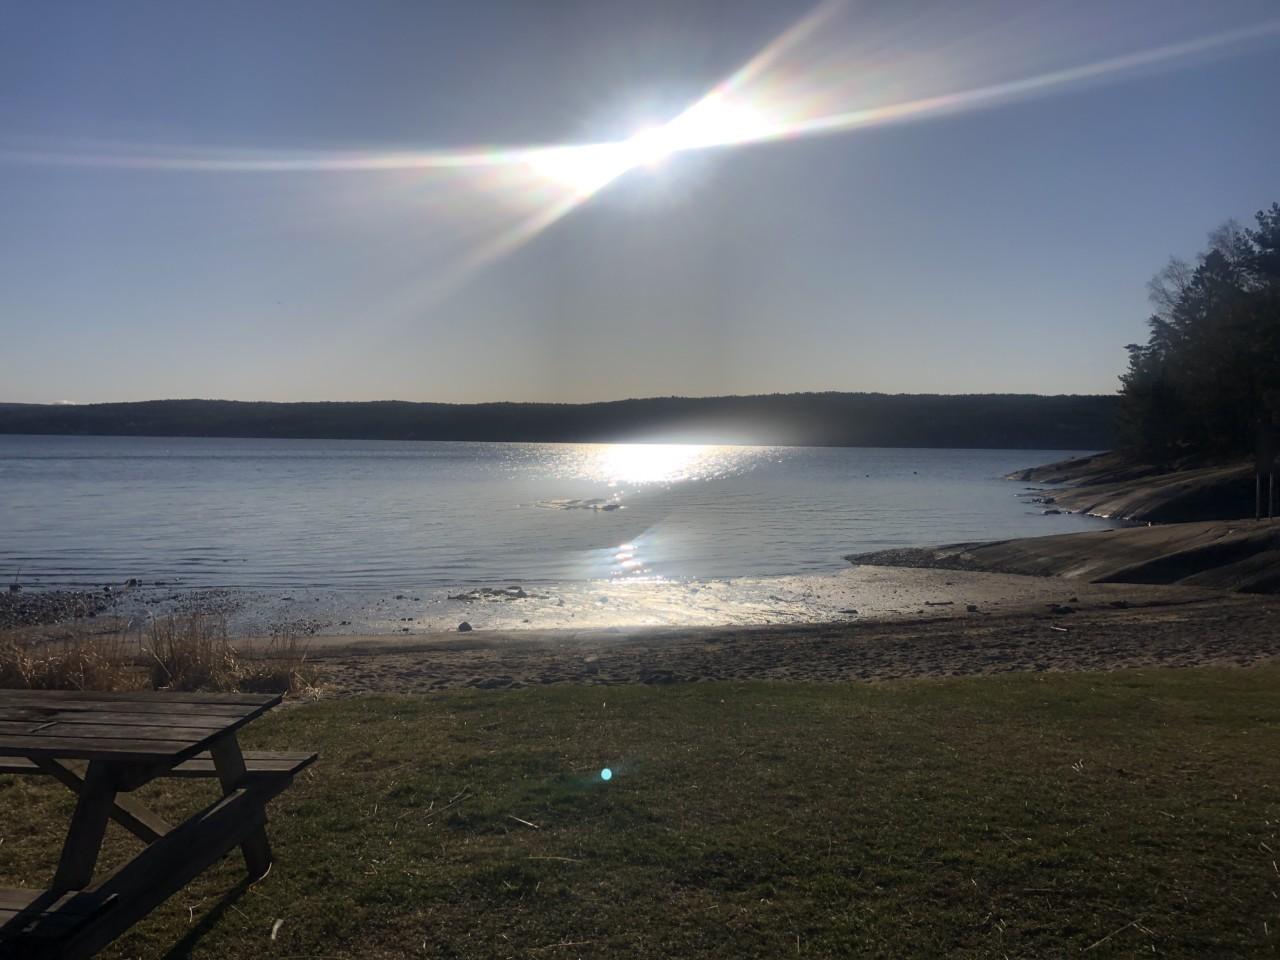 kirkevika-strand-lavvann-nesodden-hav-sol